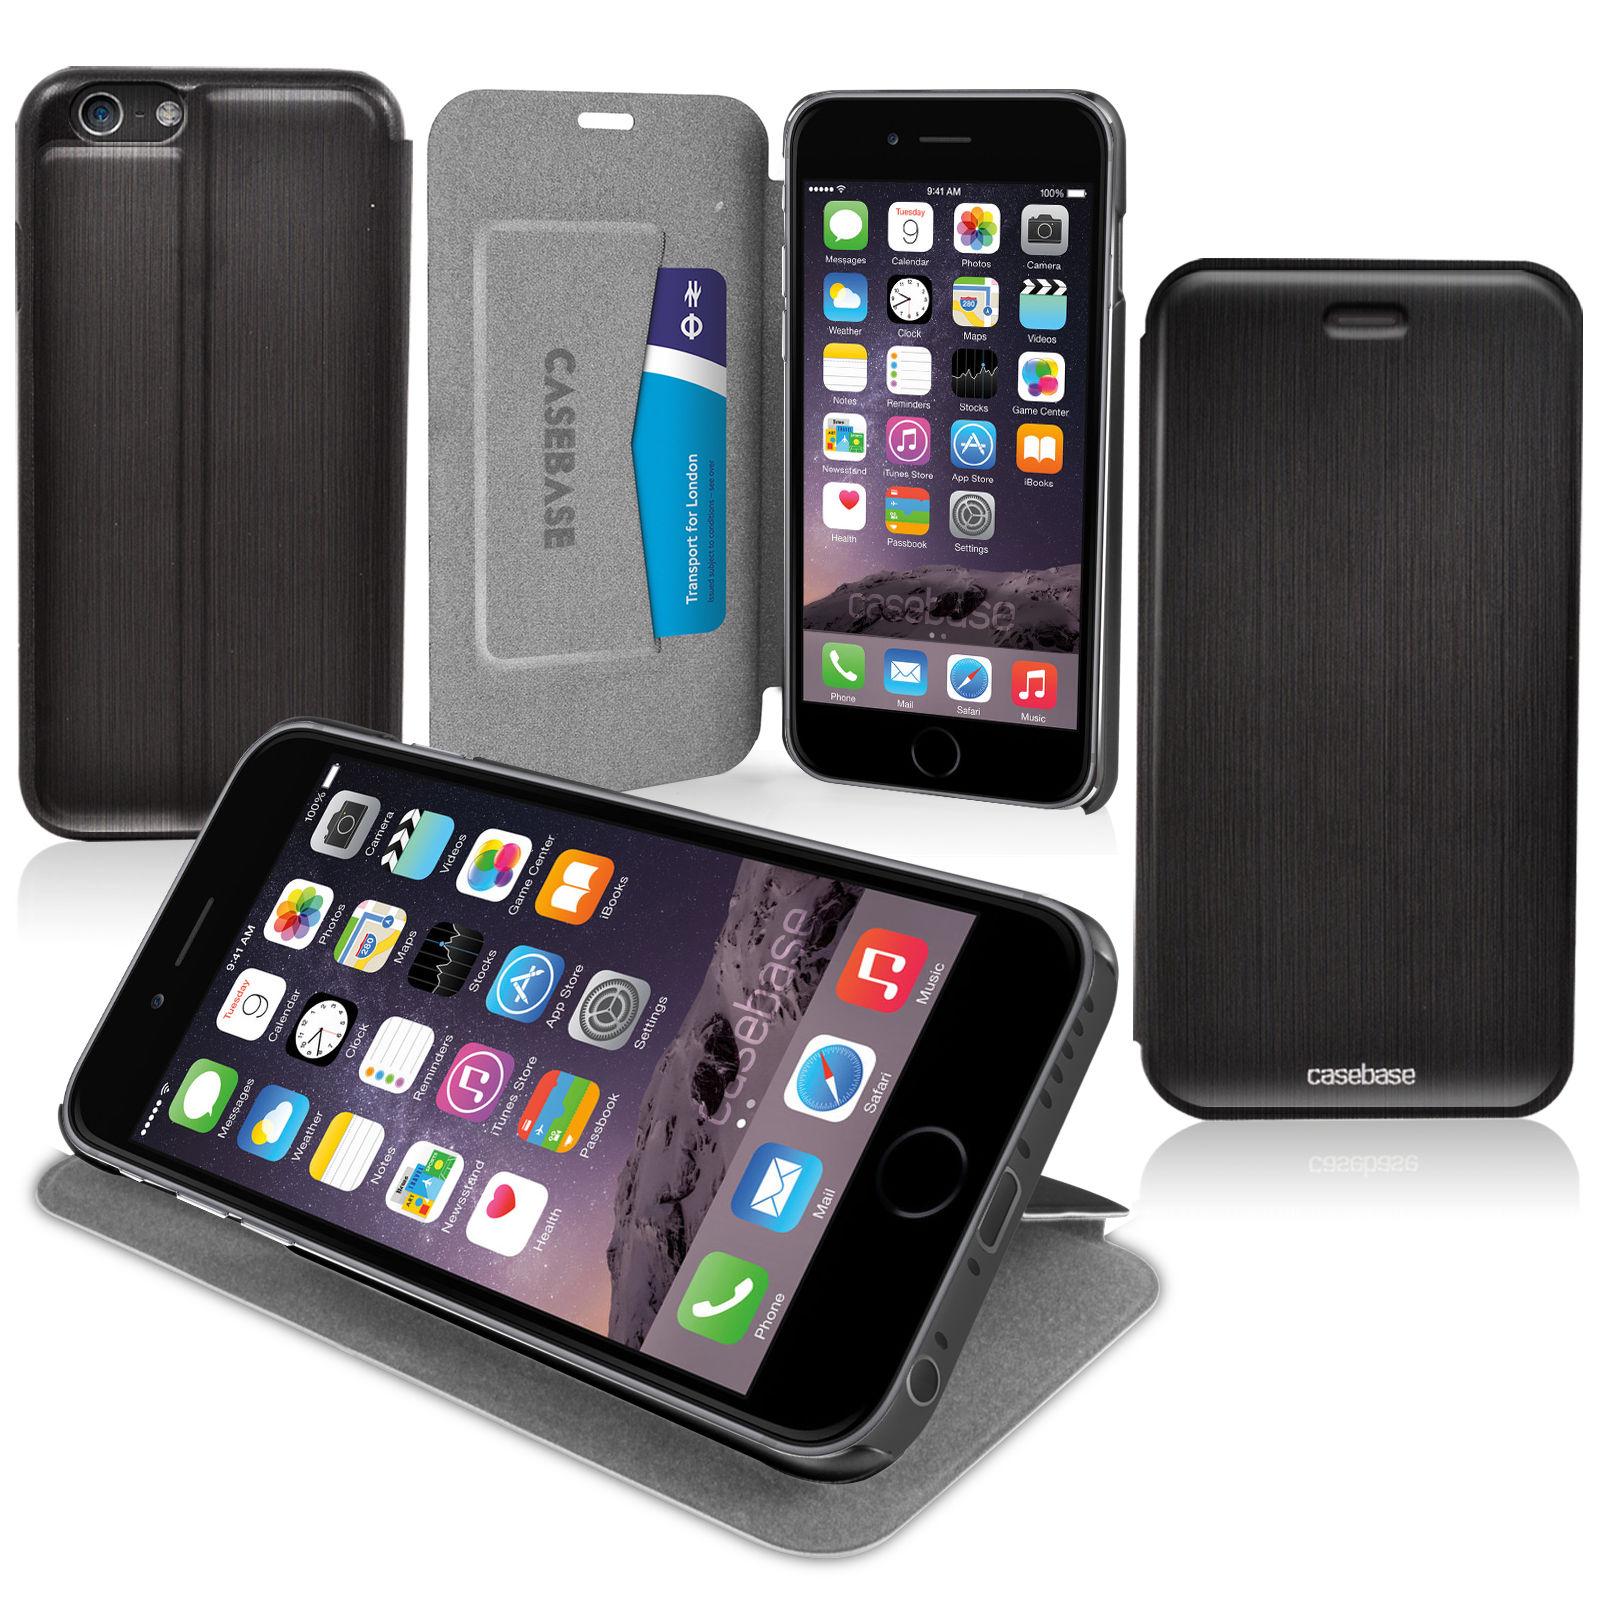 Pouzdro pro Apple iPhone 6 Plus èerné